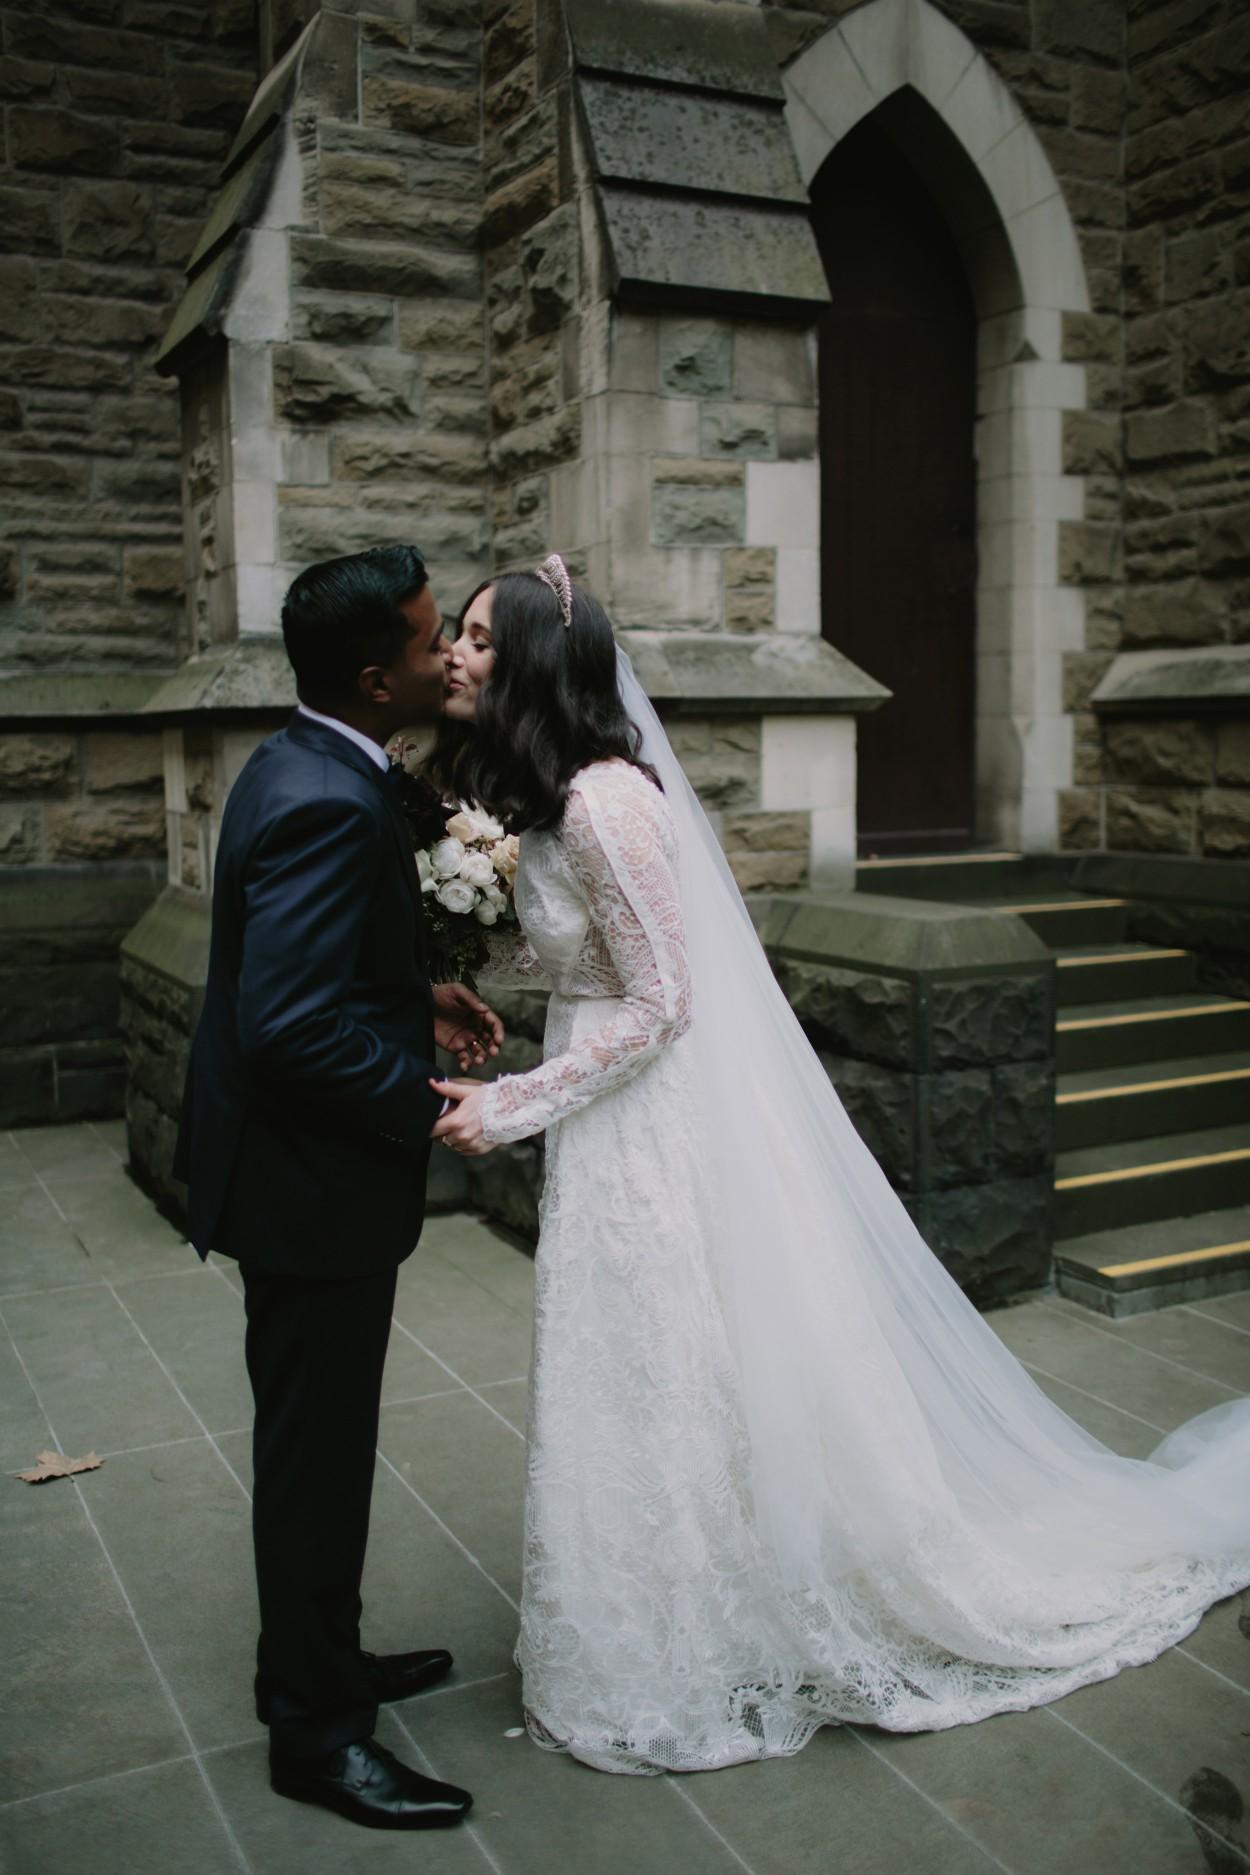 I-Got-You-Babe-Weddings-The-047George-Ballroom-St-Kilda-Wedding-Amy-Abhi.jpg